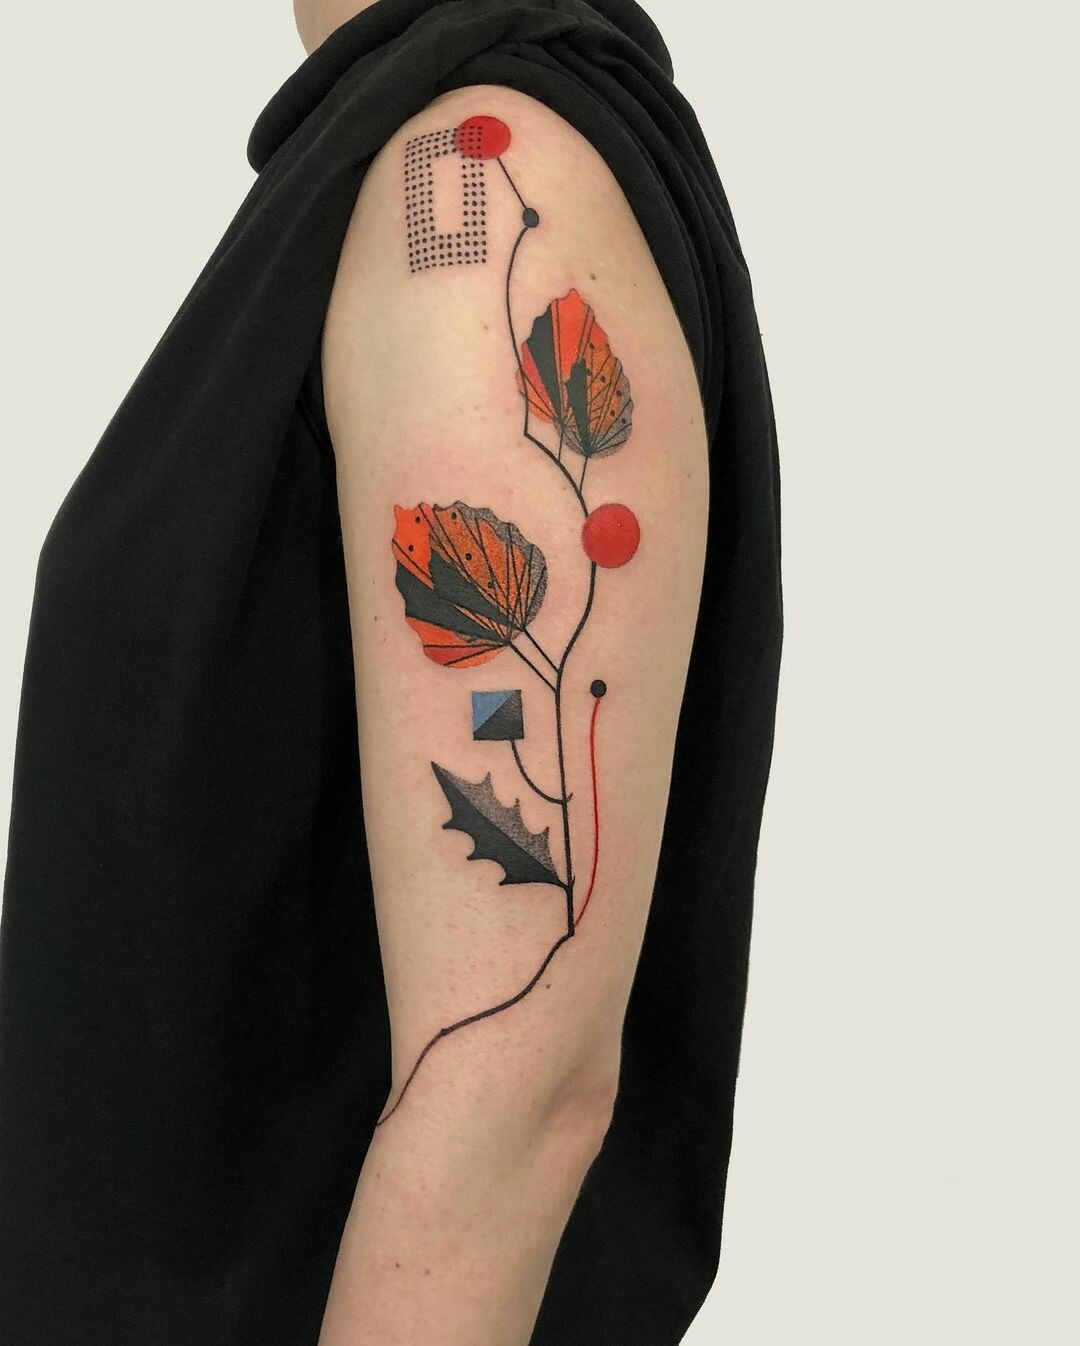 Inksearch tattoo Katusza Kwiatkowska